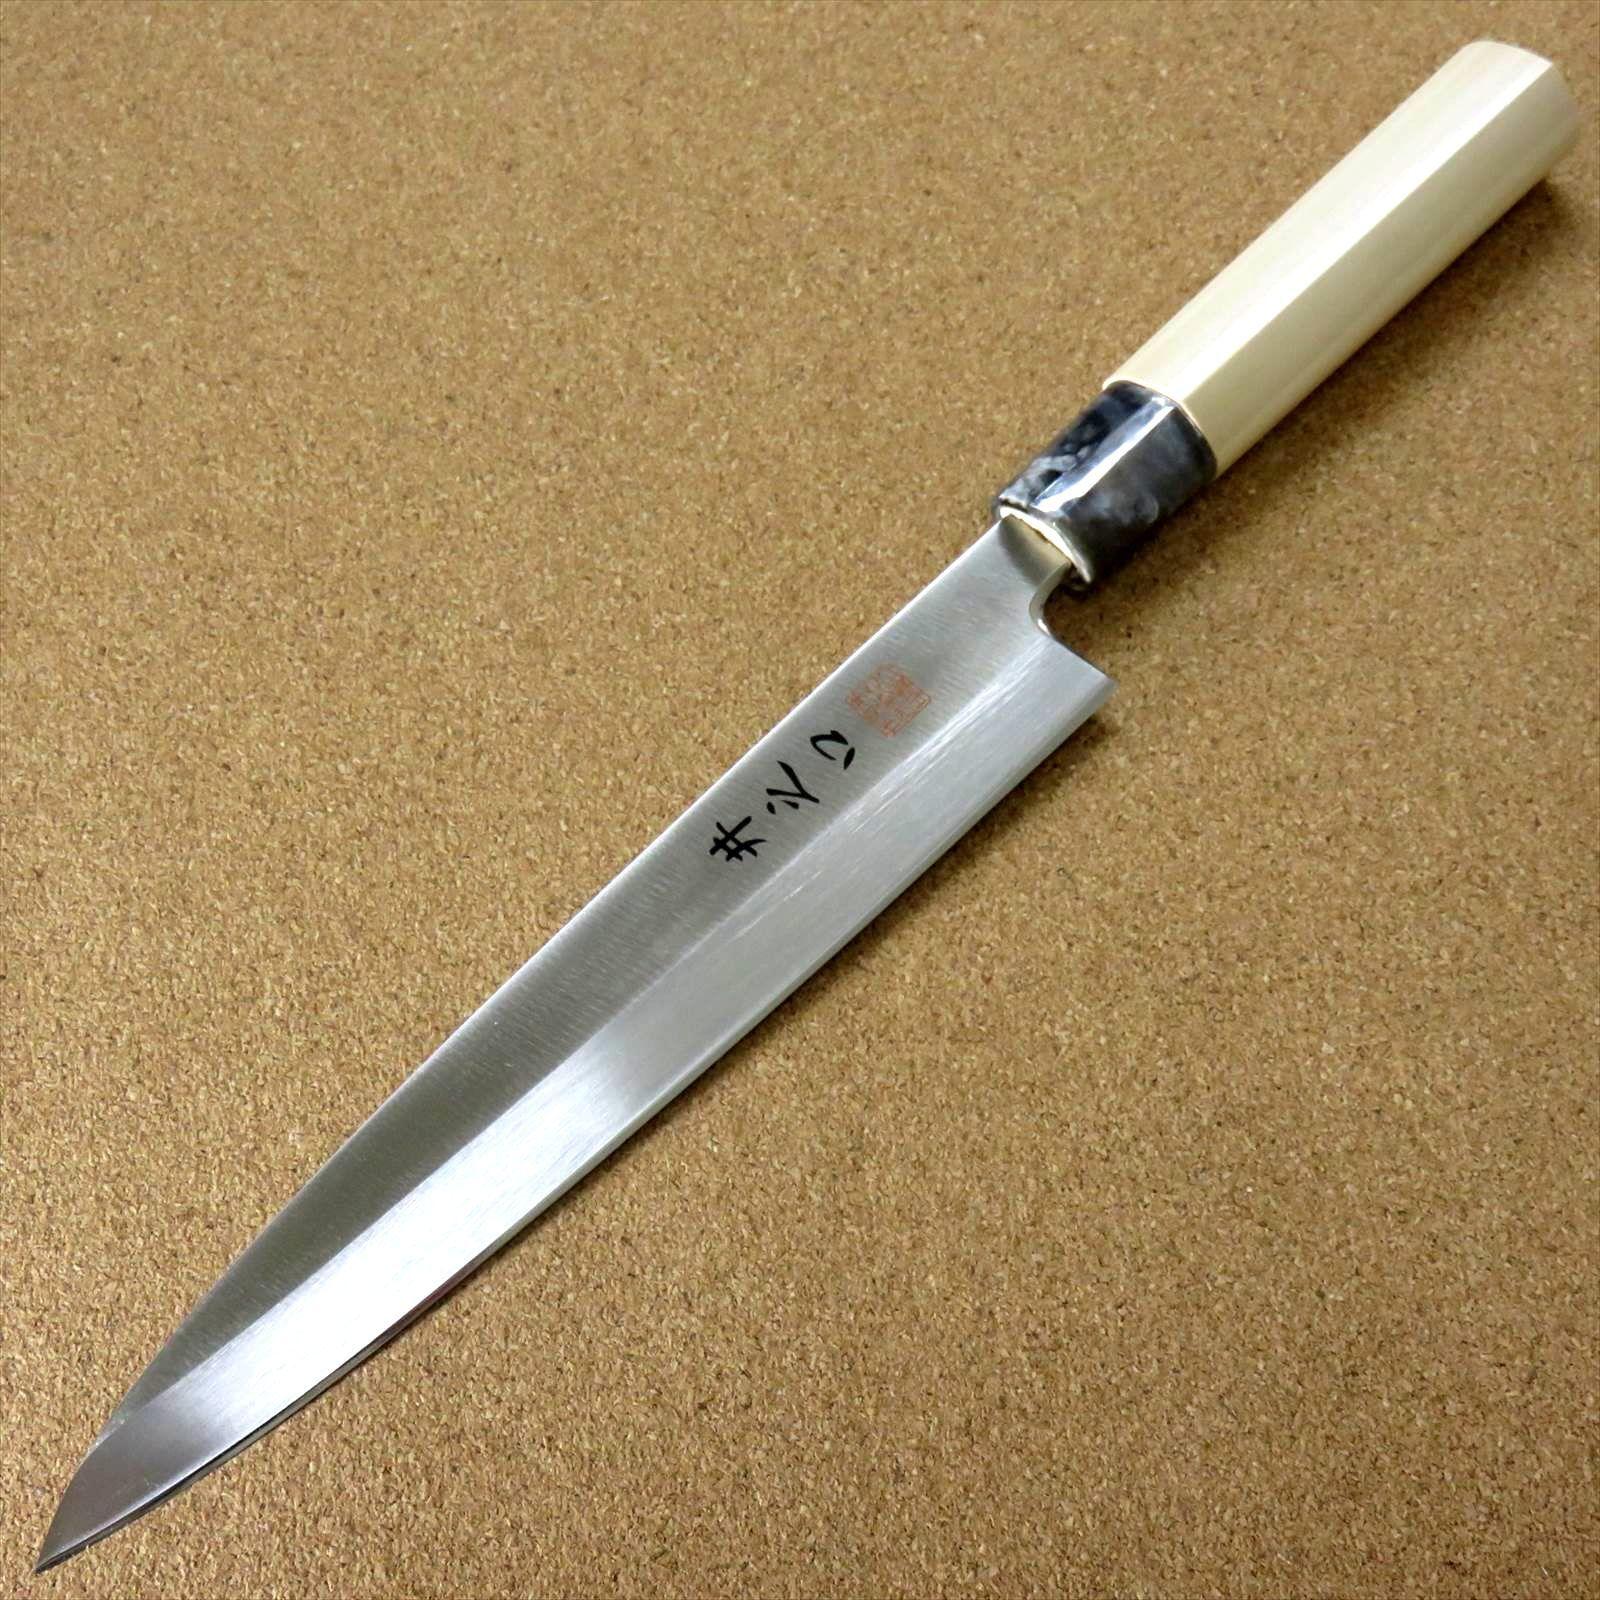 Japonais cuisine Sashimi Yanagiba Knife 8.3 in (environ 21.08 cm) Gaucher Bois Naturel Japon